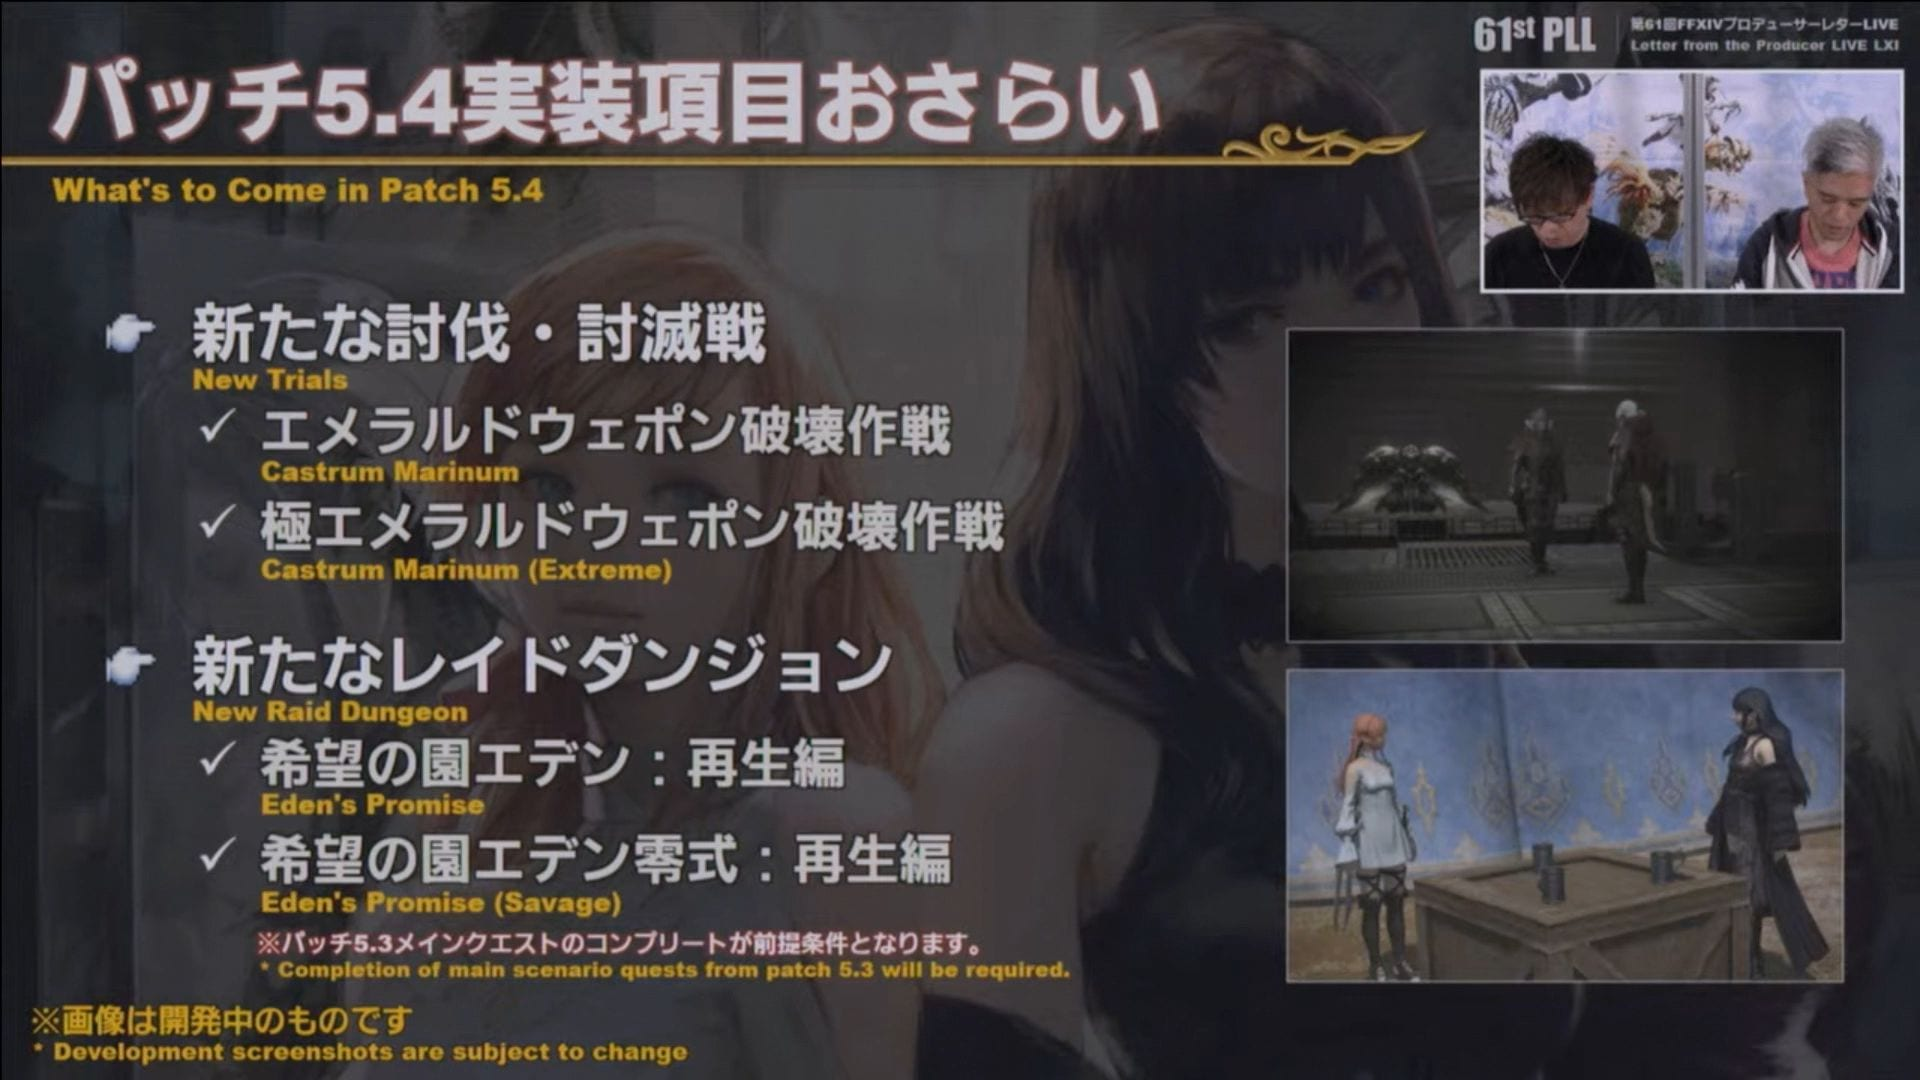 Final-Fantasy-XIV-Screenshot-2020-11-27-13-14-13.jpg